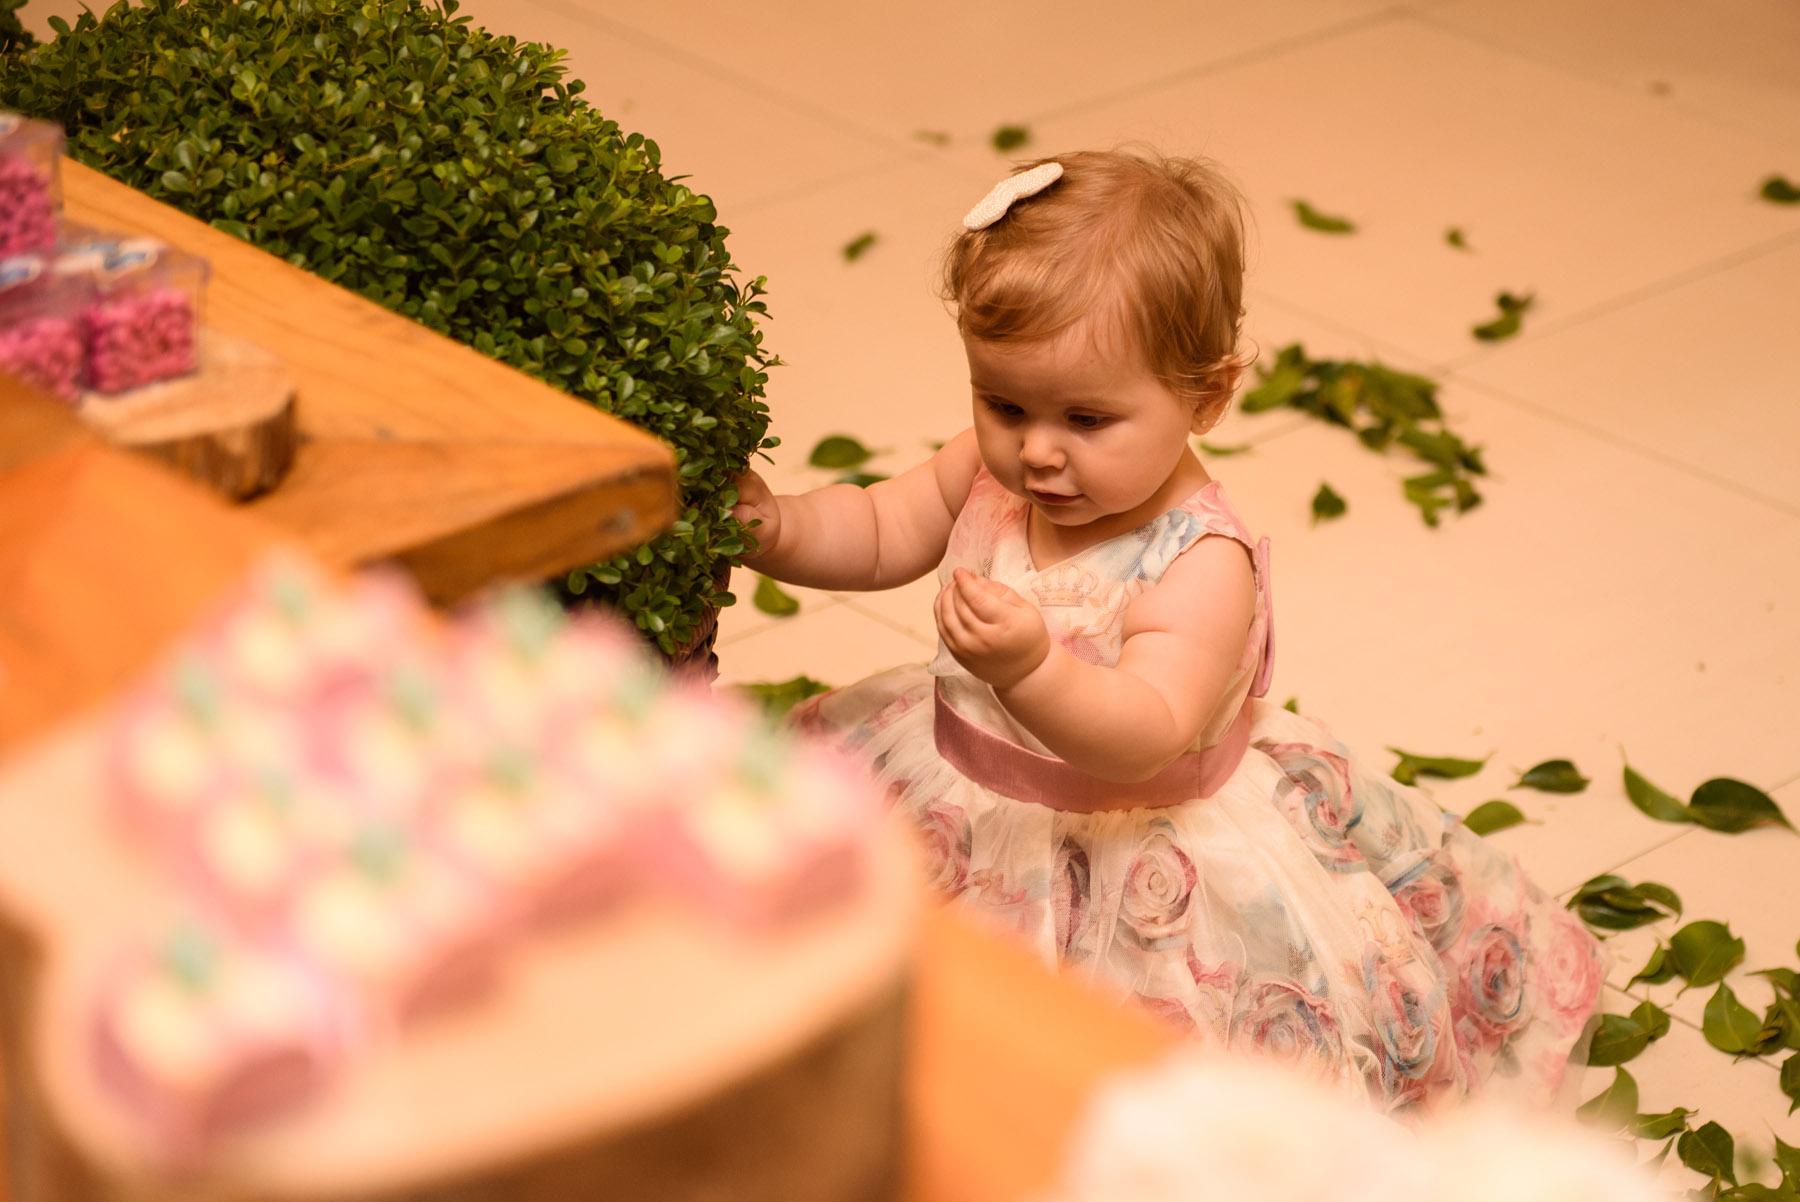 09-aniversario-infantil-1ano-mundo-kids-festa-infantil-curitiba-guswanderley.jpg